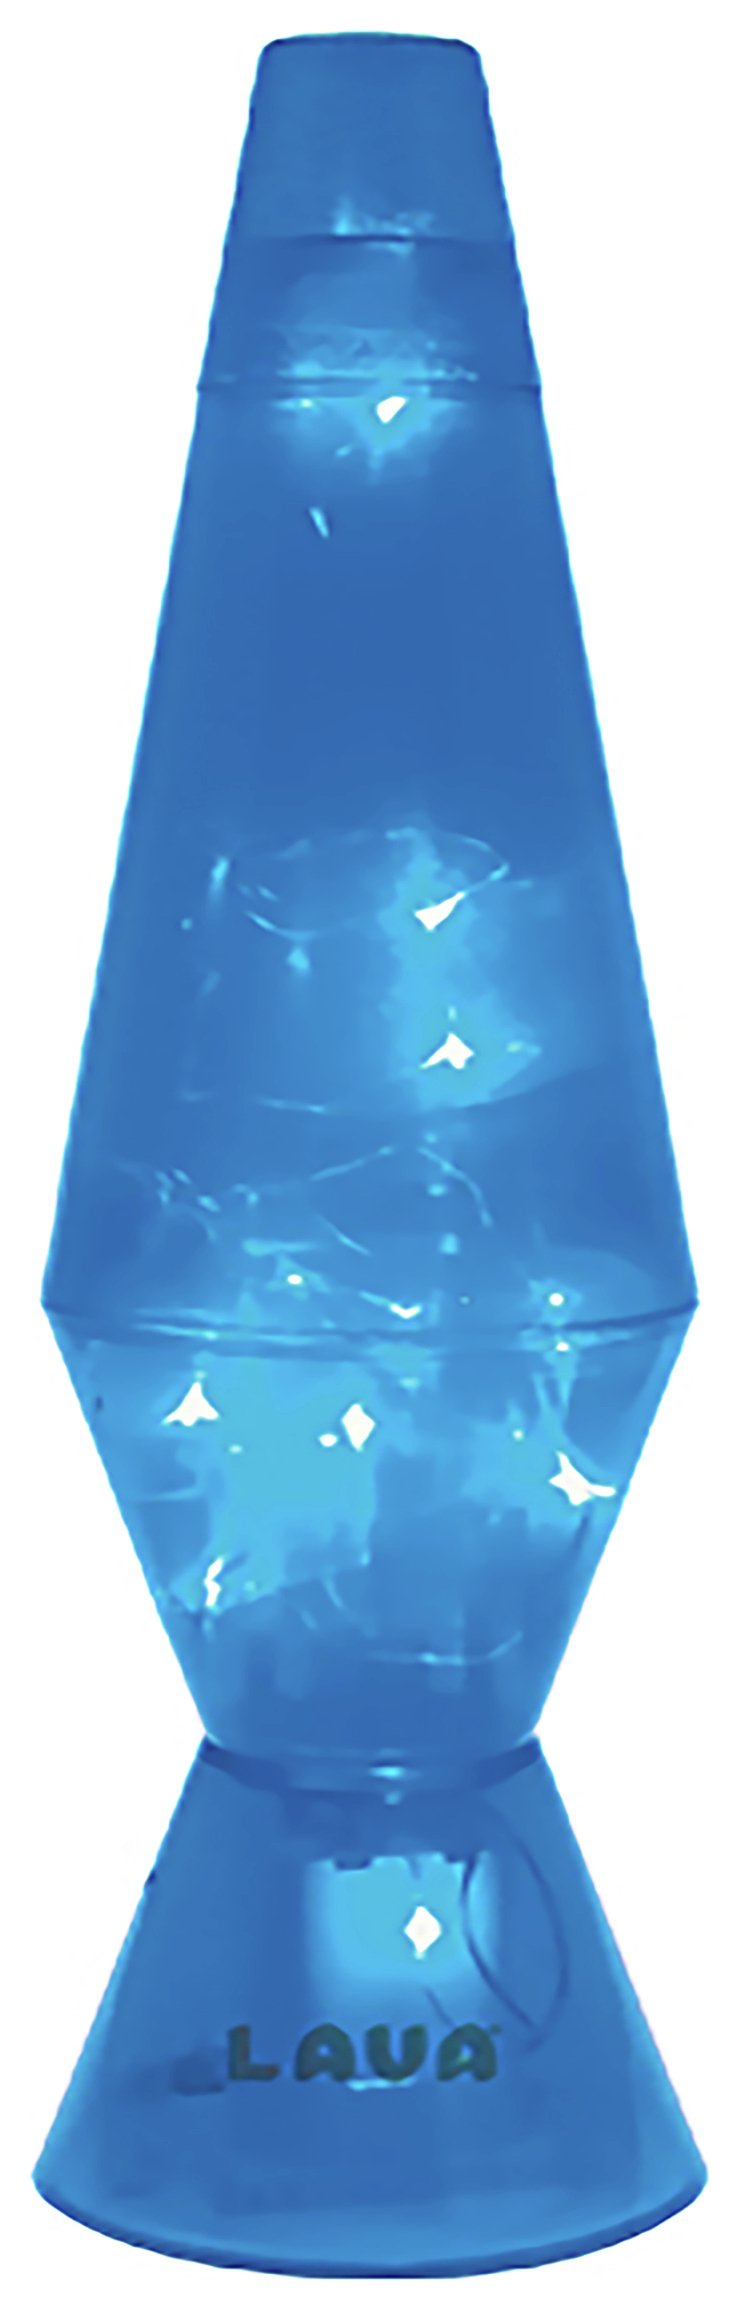 Image of Blue LED Twinkle Lava Lamp.